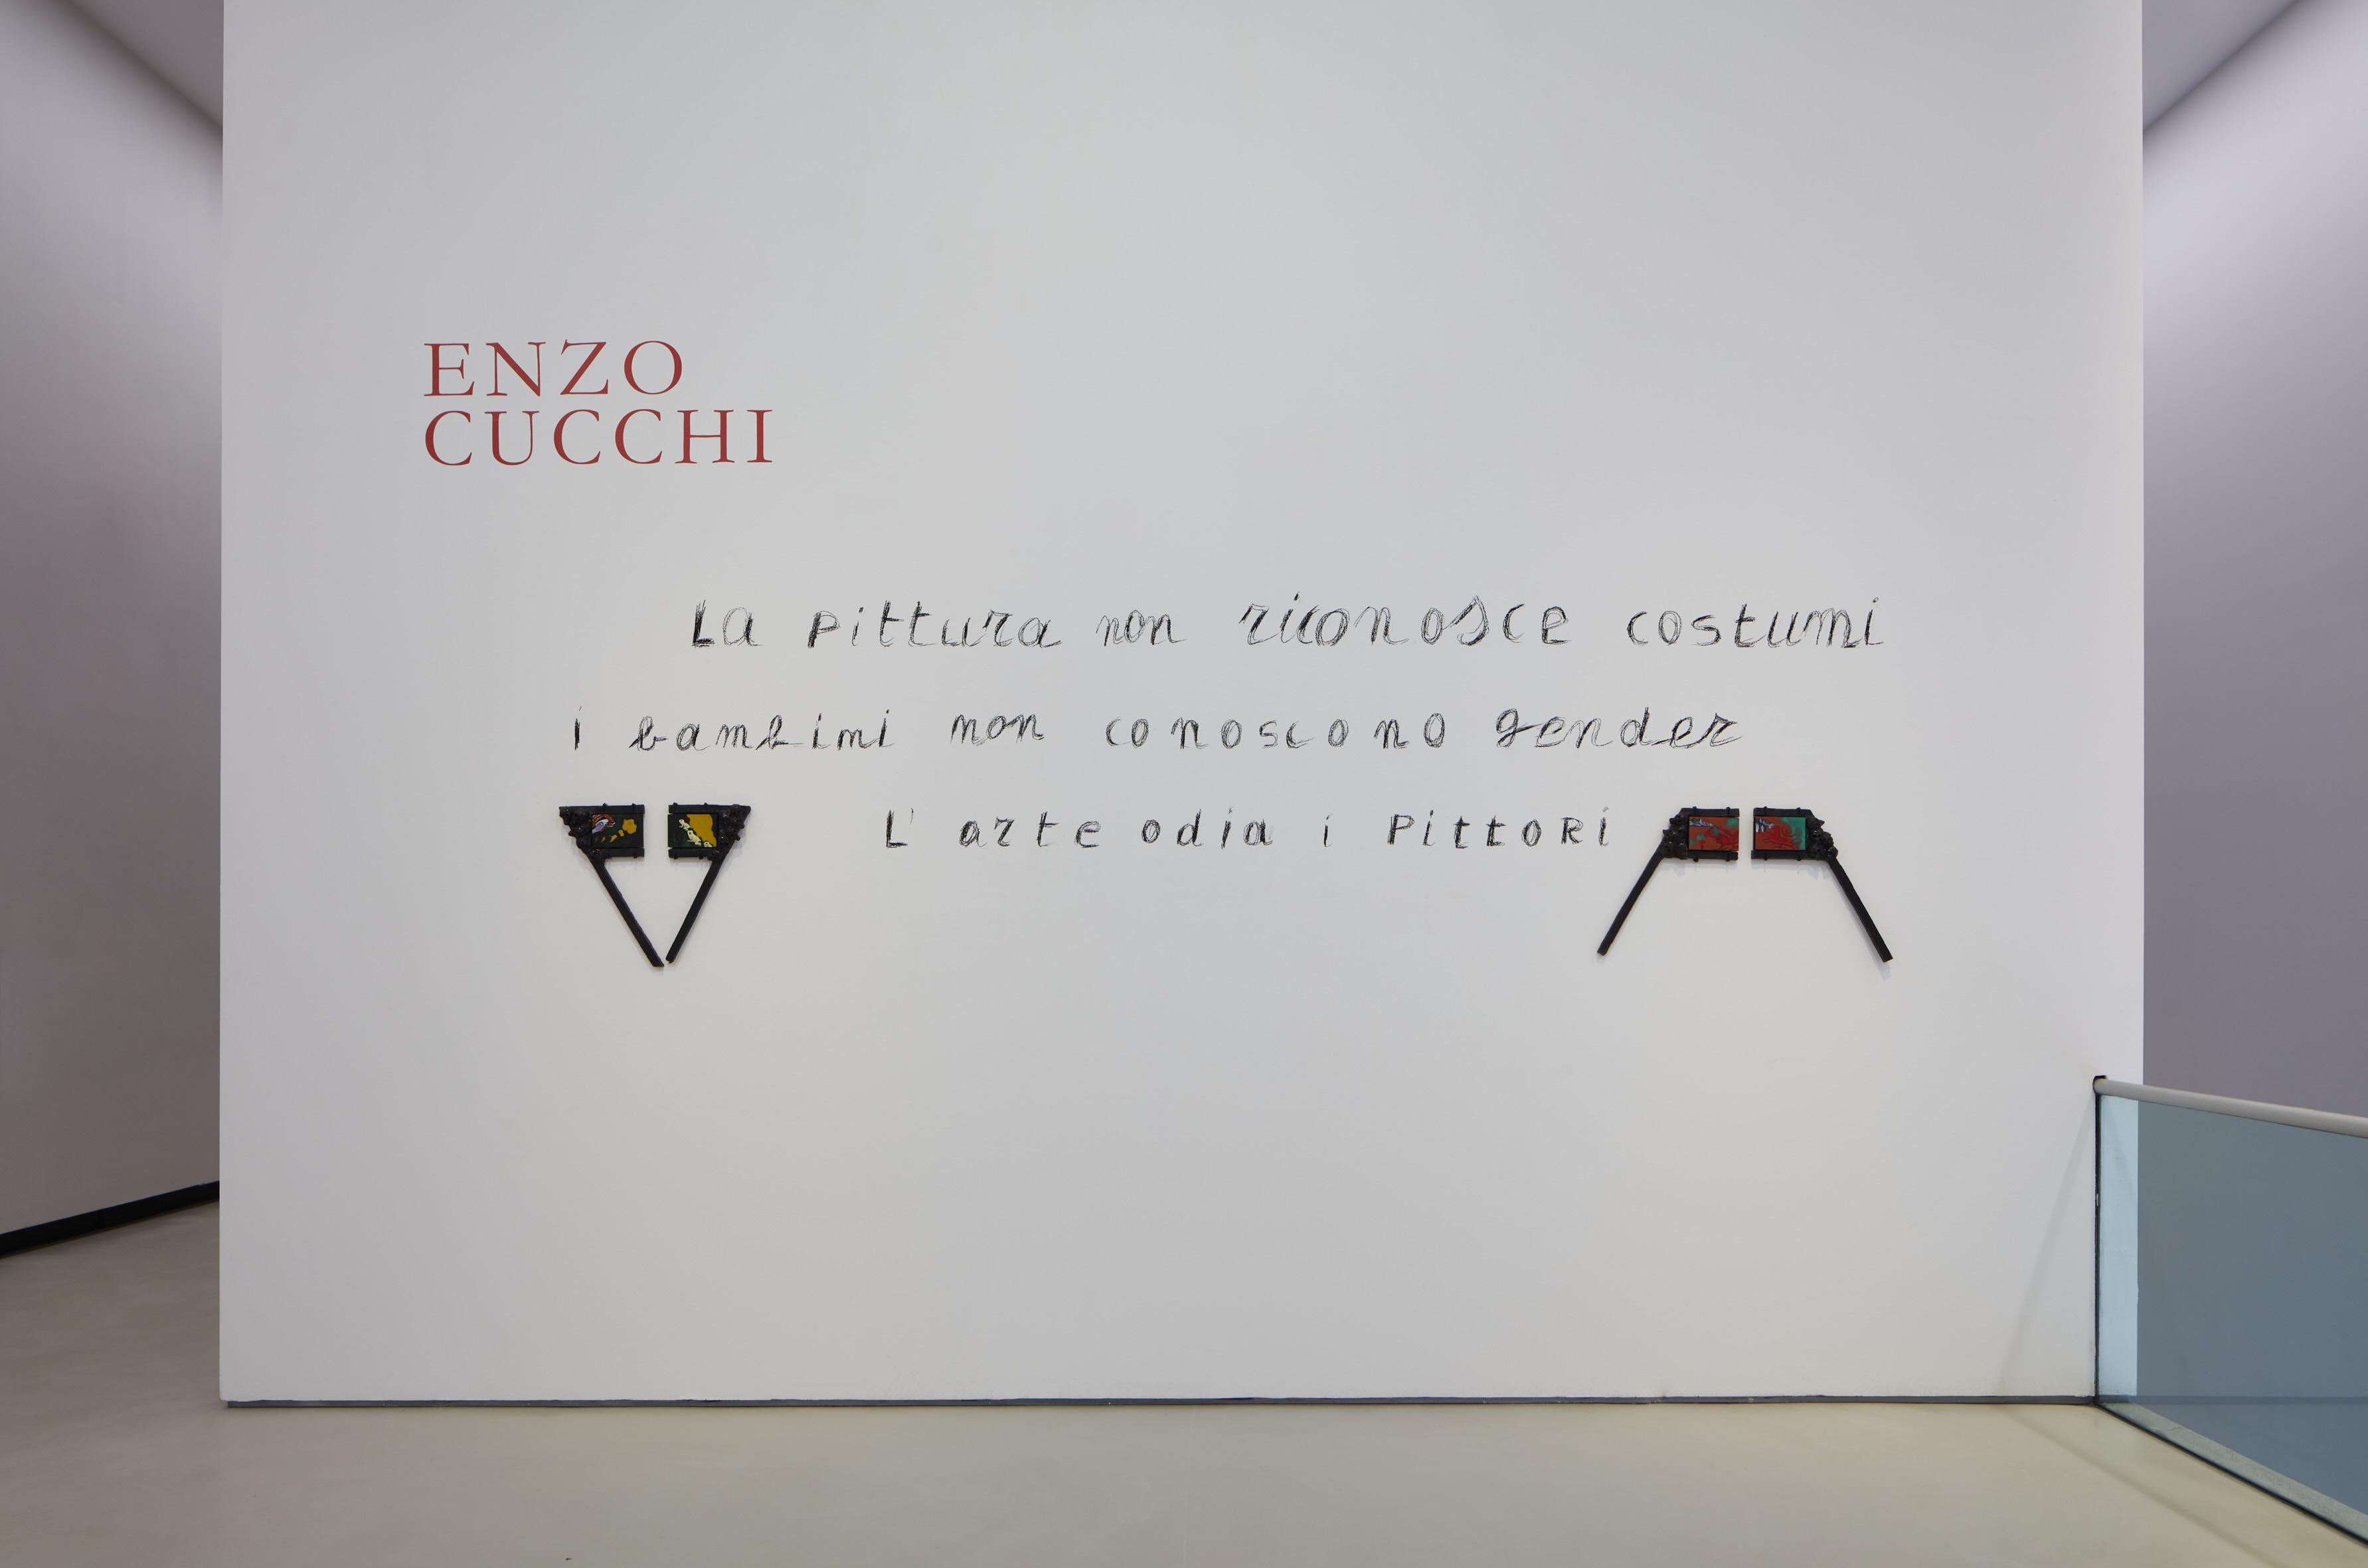 Enzo Cucchi maxxi